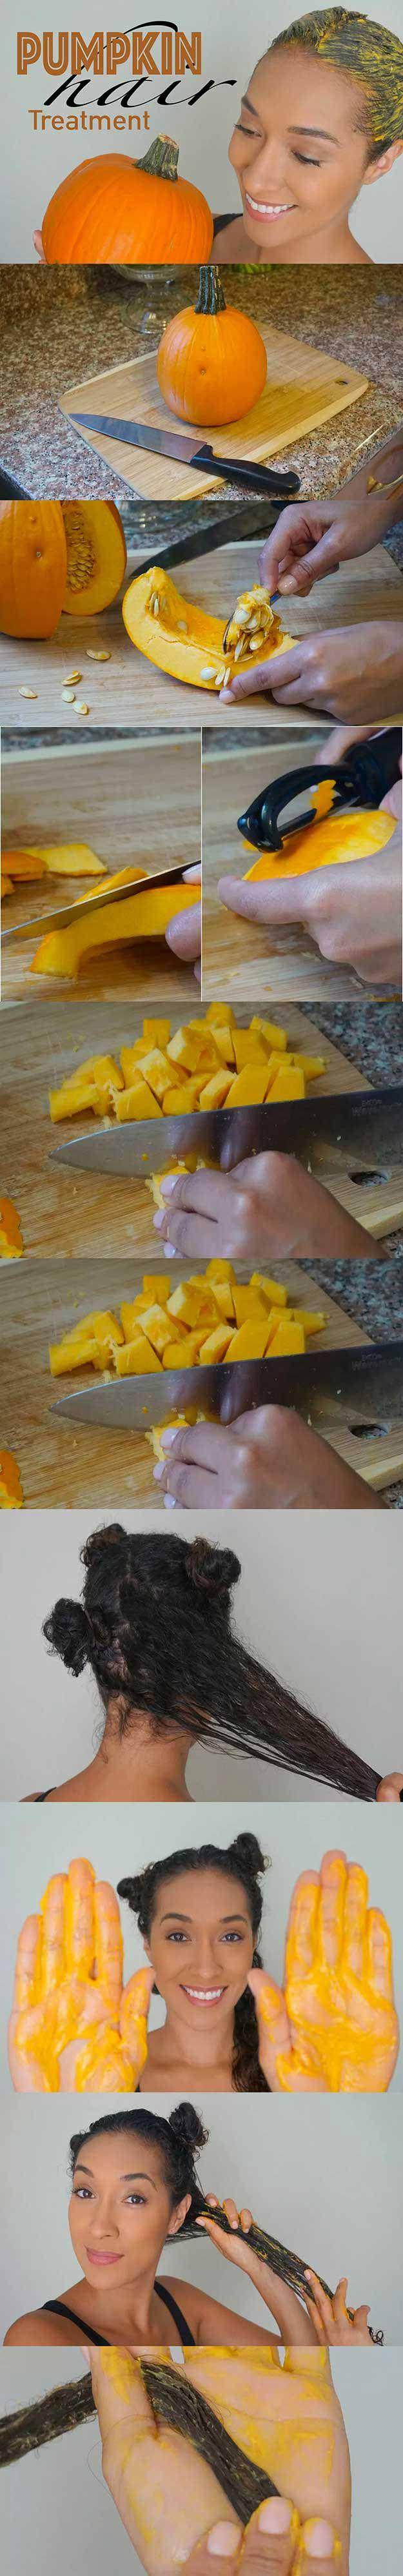 Tips and Tricks For Long, Healthy Hair - Healthy Hair Diet Pumpkin Deep Conditio...